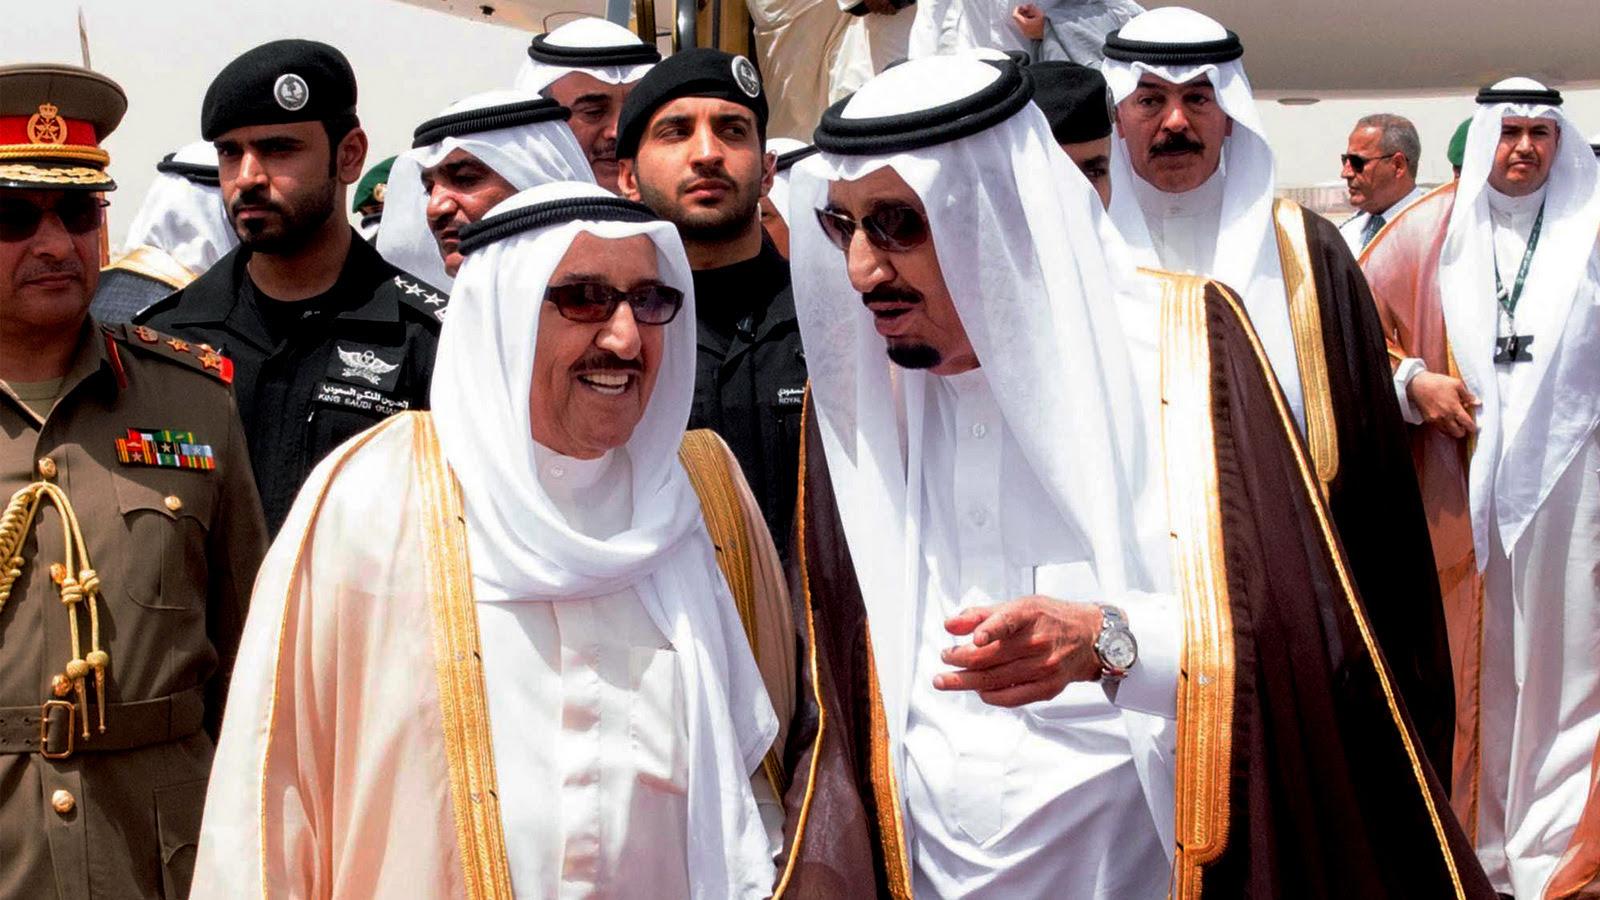 King Salman of Saudi Arabia, right, welcomes Kuwaiti Prince Sabah Al Ahmed Al Sabah upon his arrival to Riyadh Airbase before the opening of Gulf Cooperation Council summit in Riyadh, Saudi Arabia,, May 5, 2015. (Saudi Arabian Press/AP)